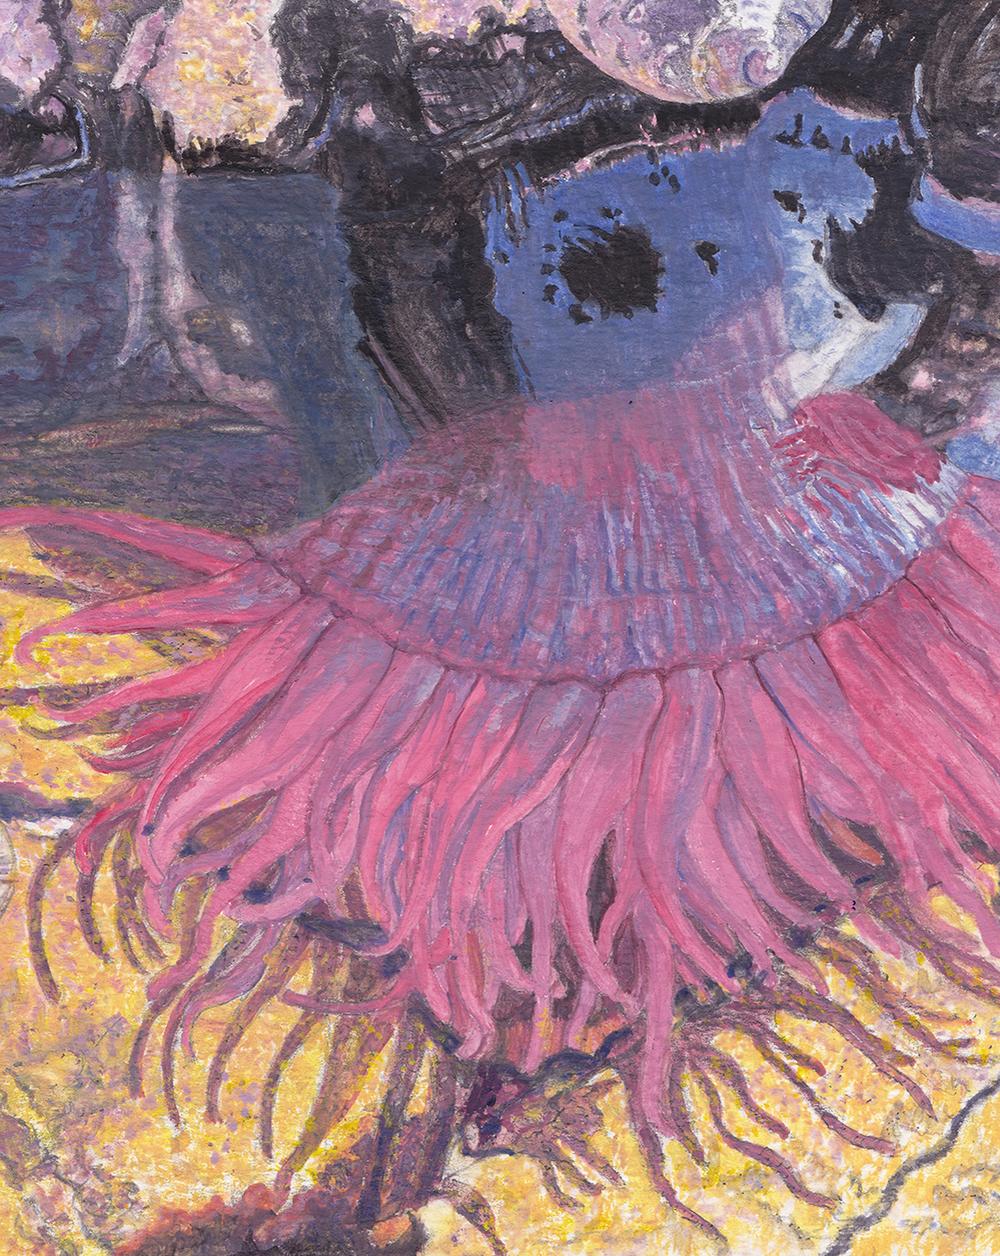 52 SEA anemone final painting WEB copy.jpg